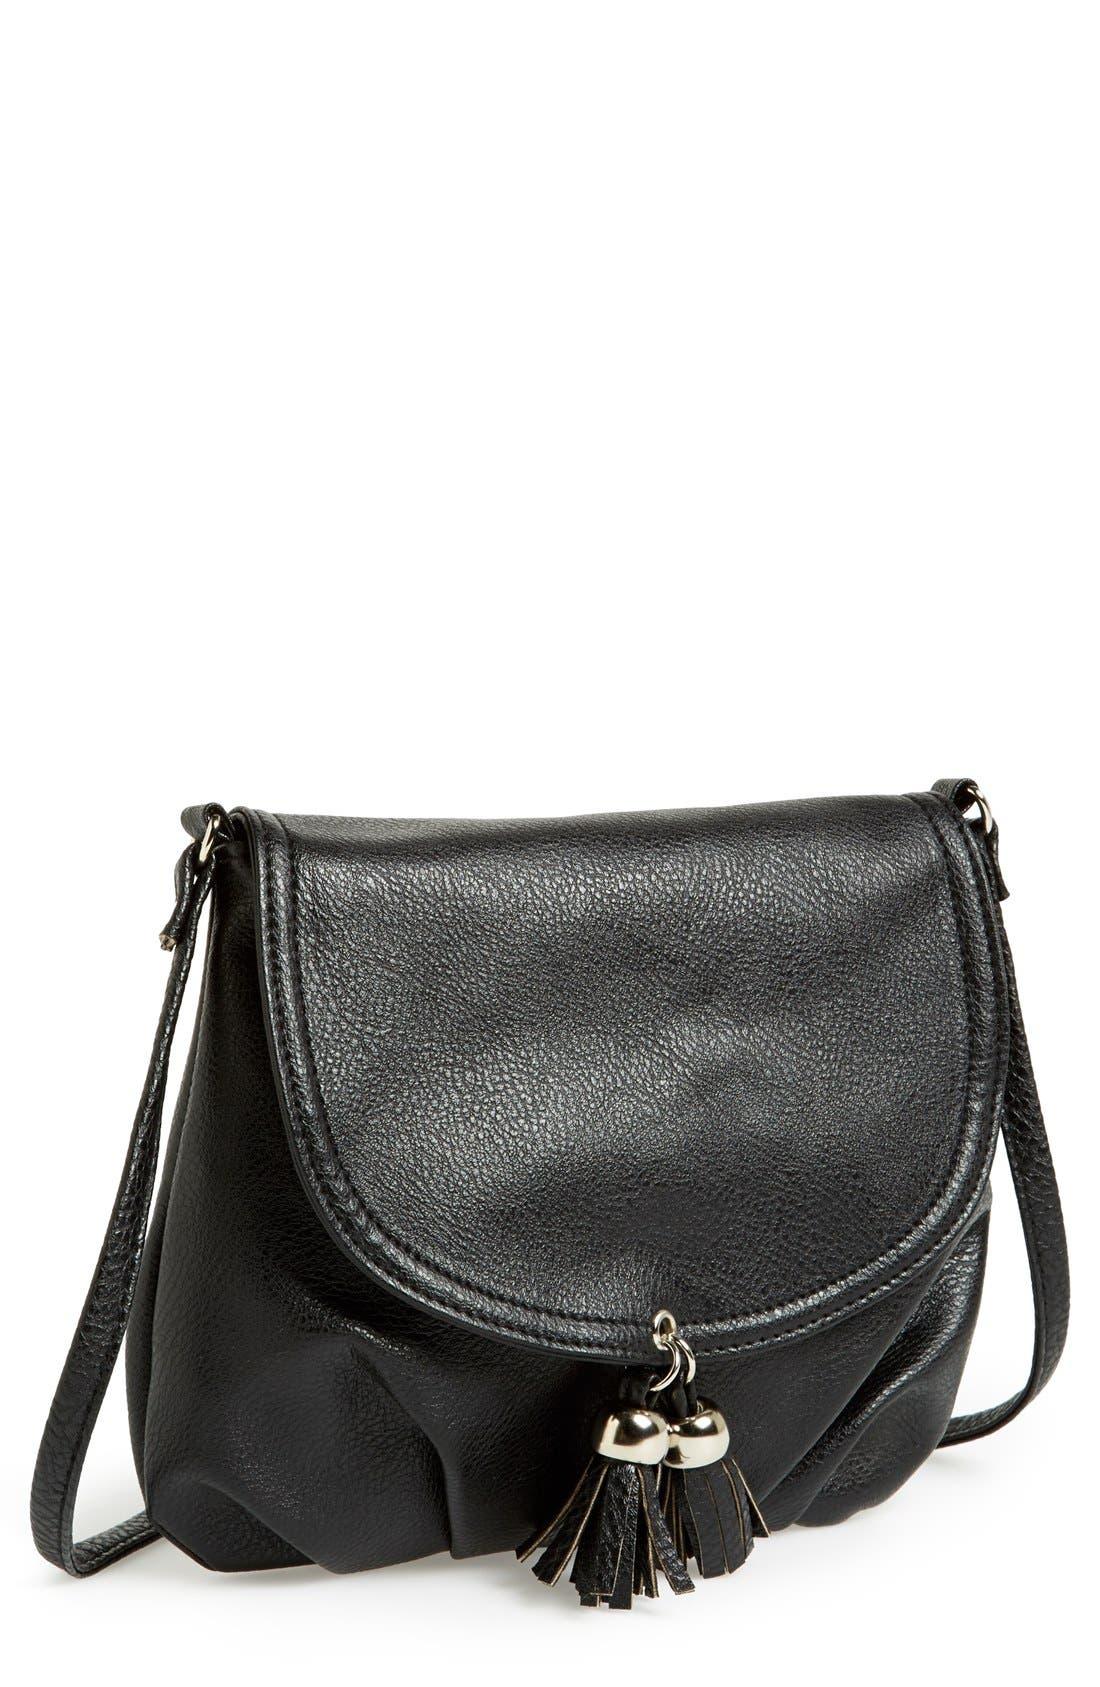 Alternate Image 1 Selected - Amici Accessories Tassel Crossbody Bag (Juniors)